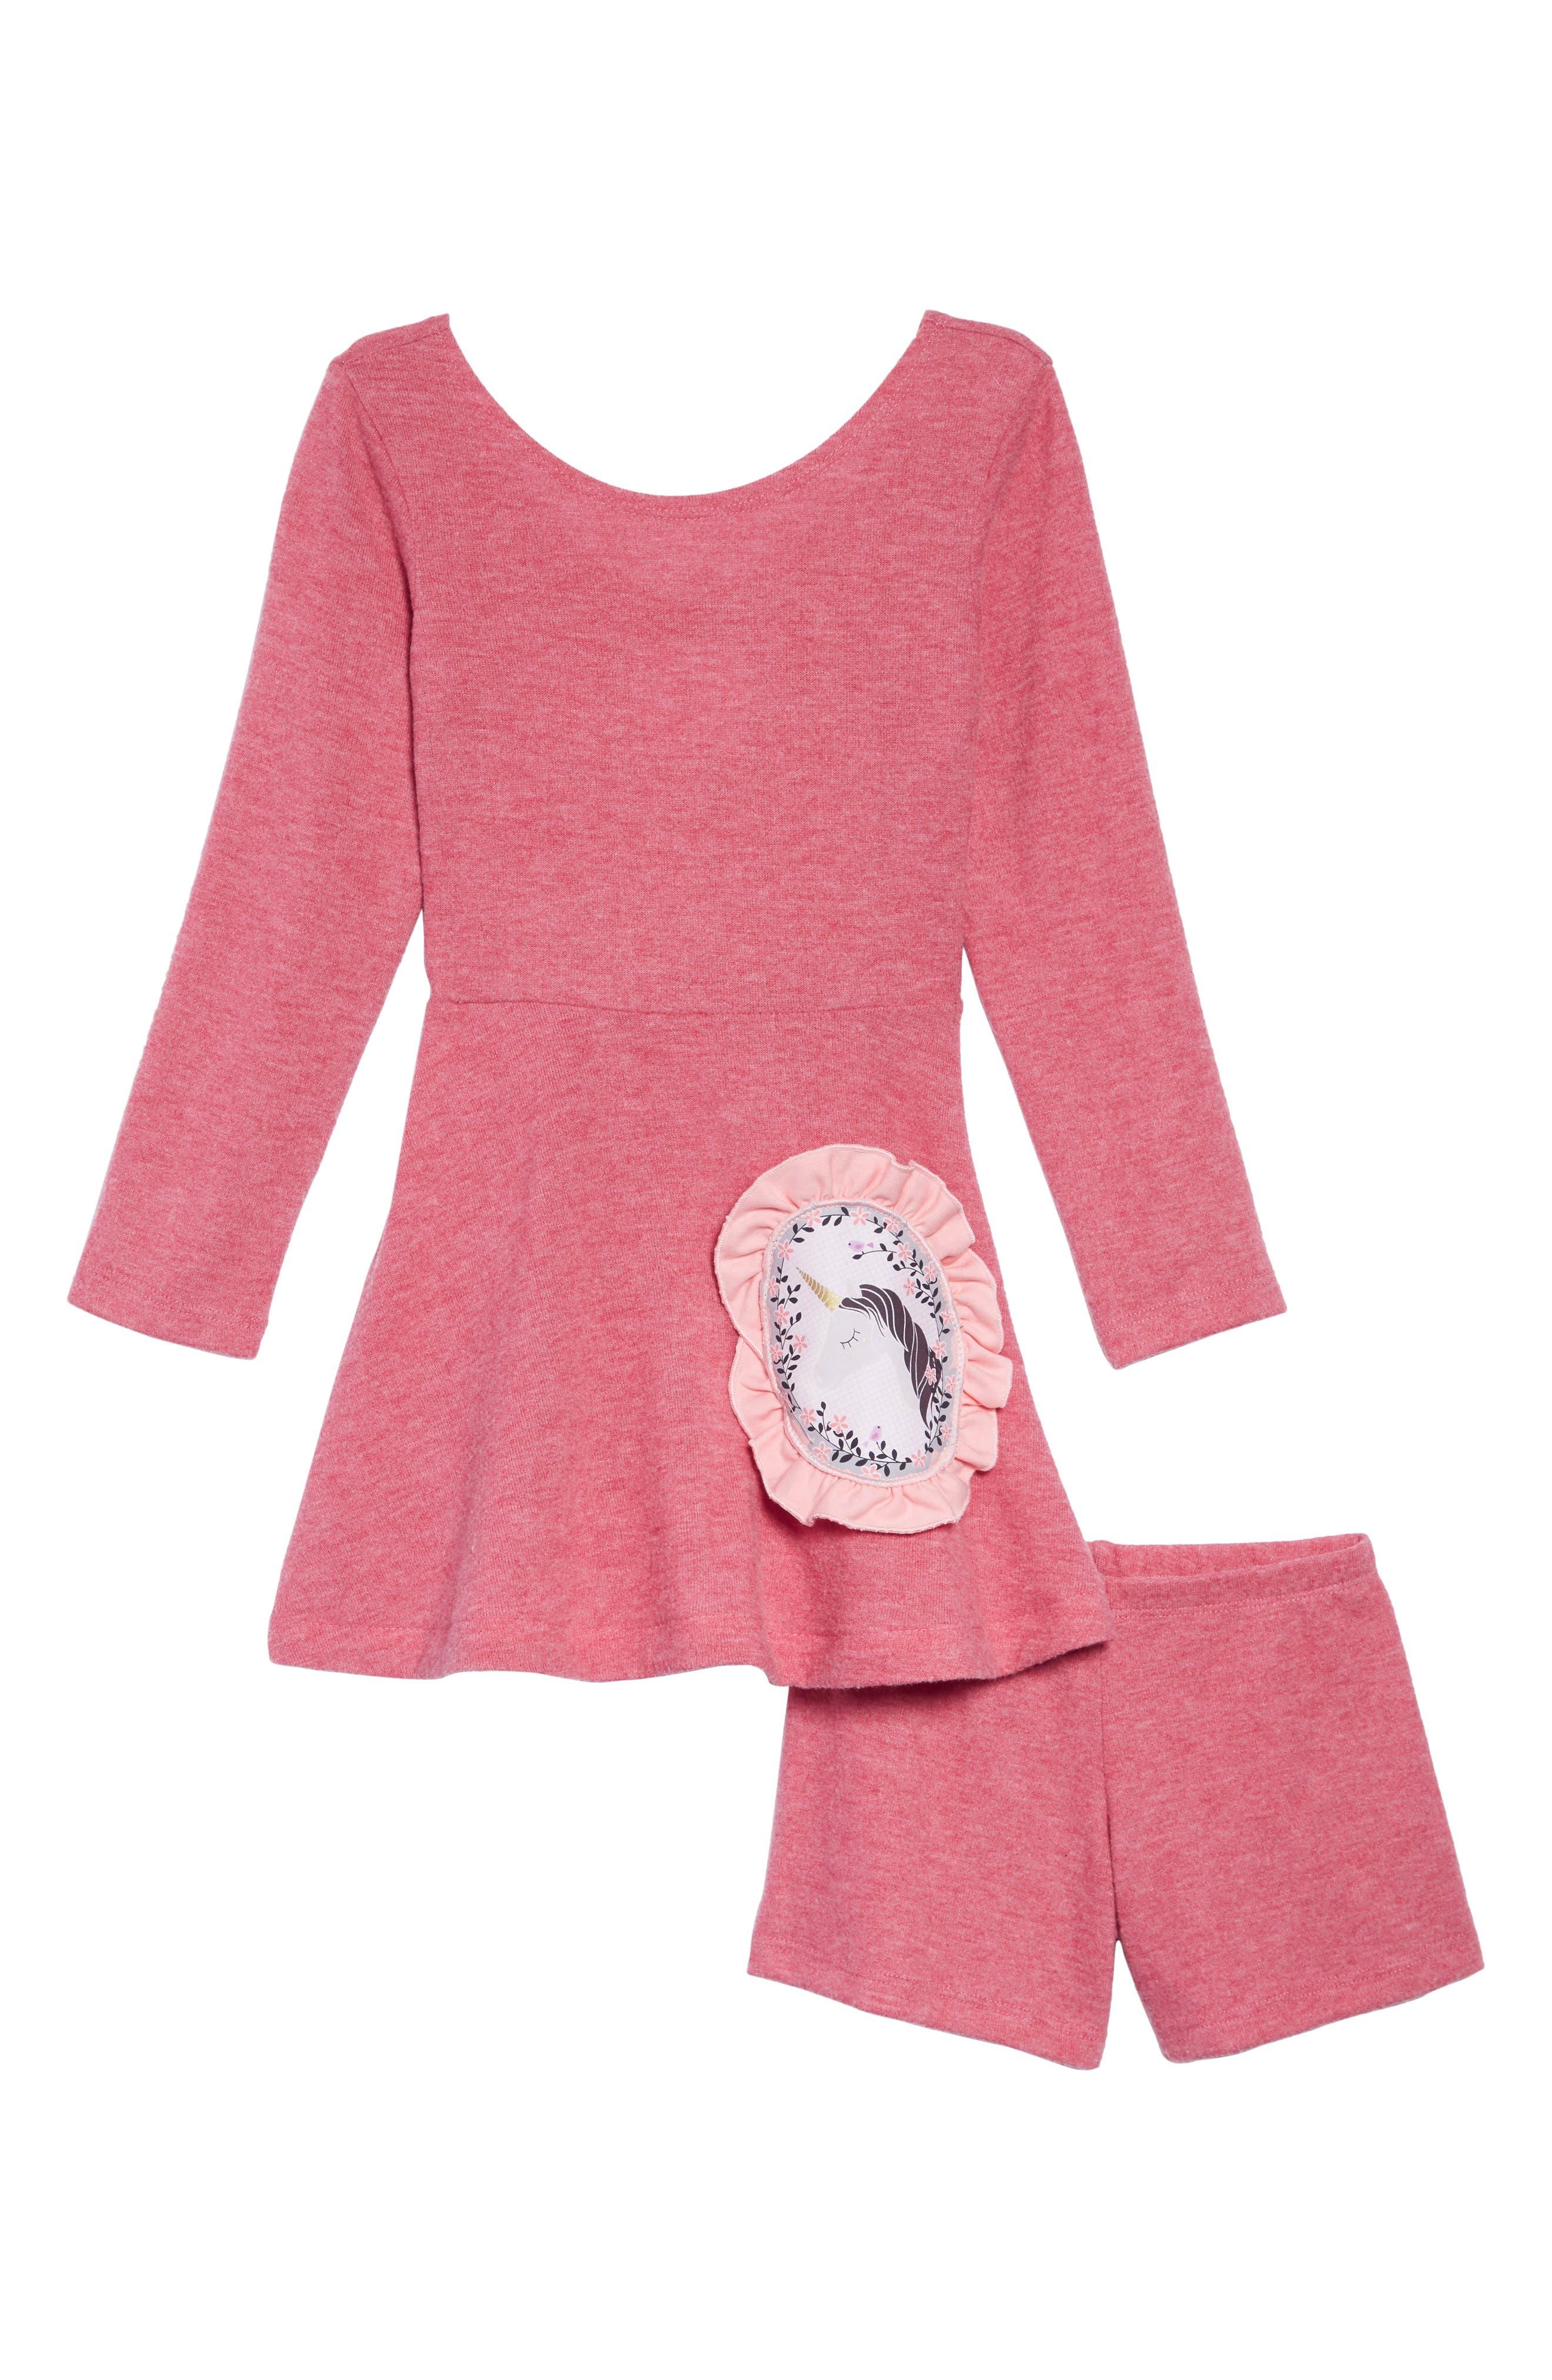 FIVELOAVES TWOFISH Knit Skater Dress, Main, color, 650